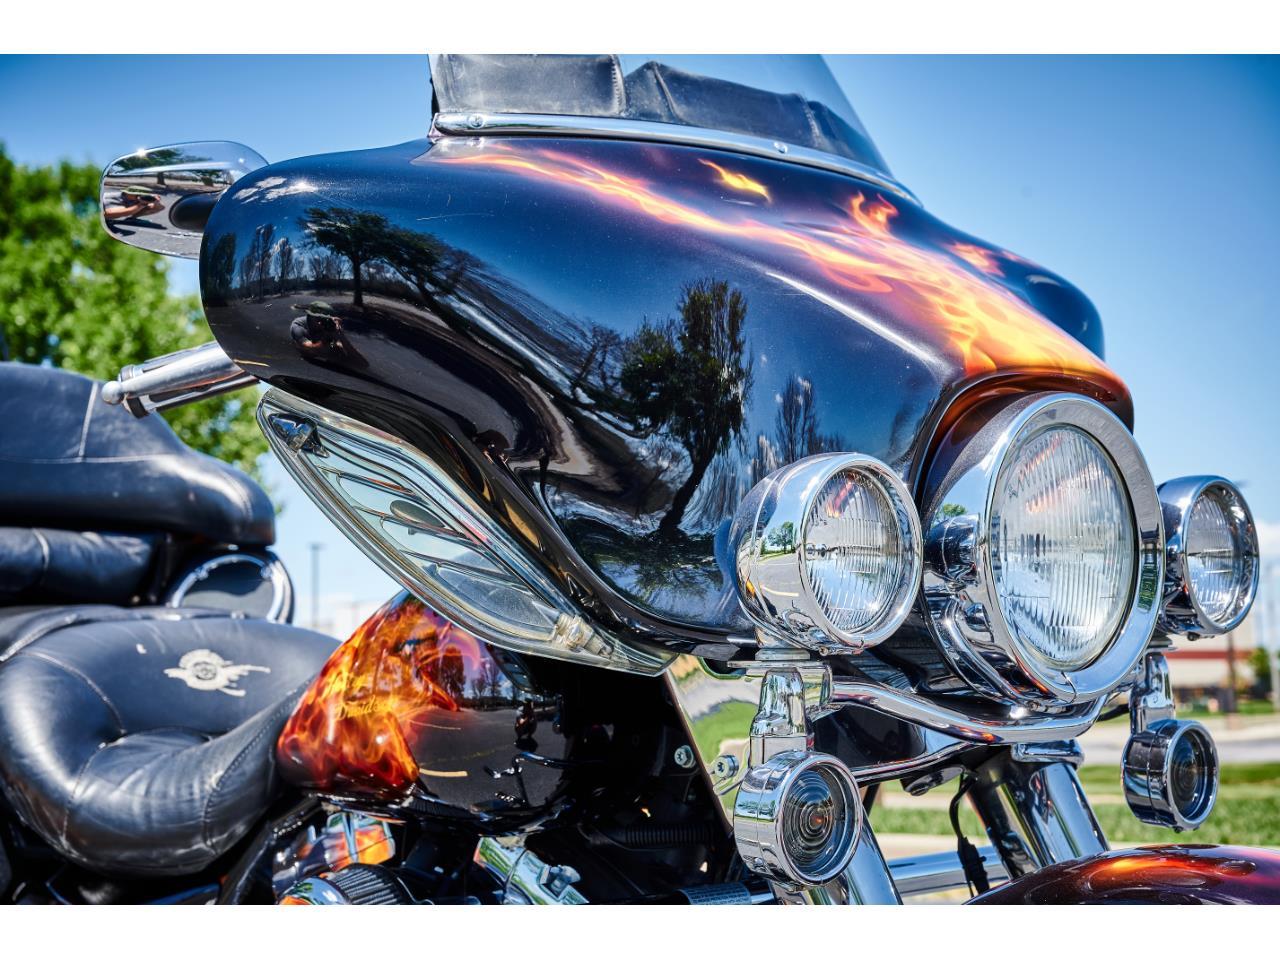 2004 Harley-Davidson FLHTCU (CC-1377816) for sale in O'Fallon, Illinois